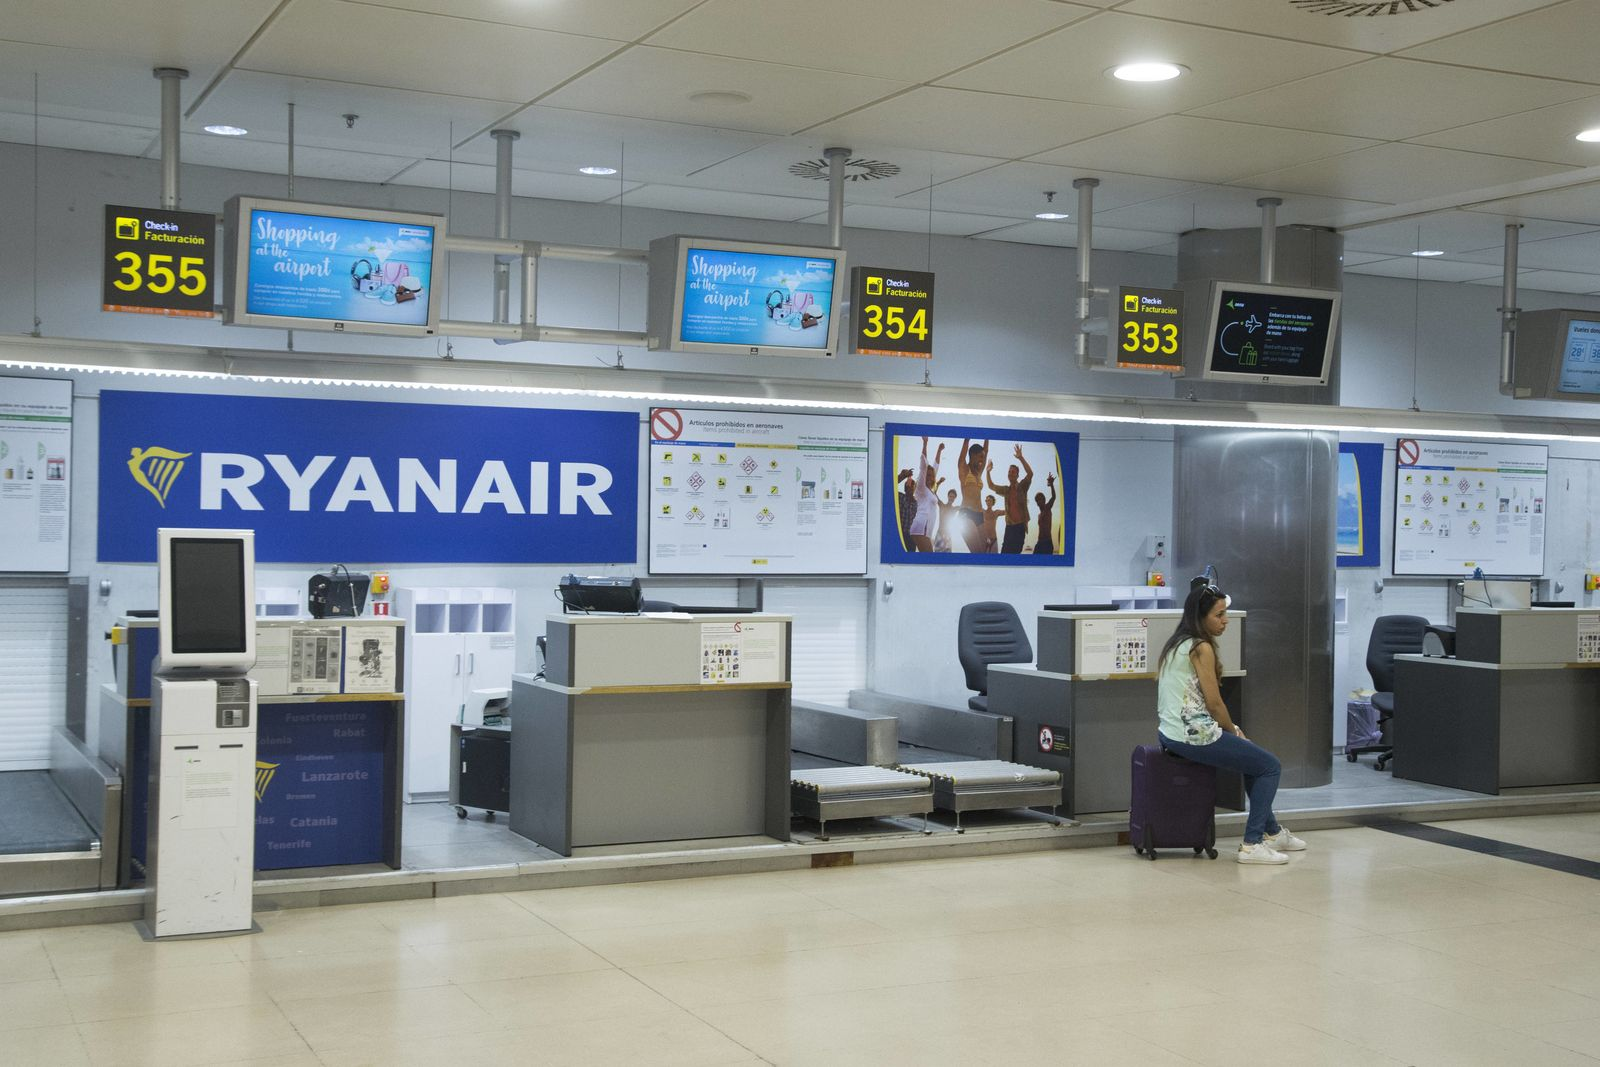 Flugbegleiterstreik bei Ryanair